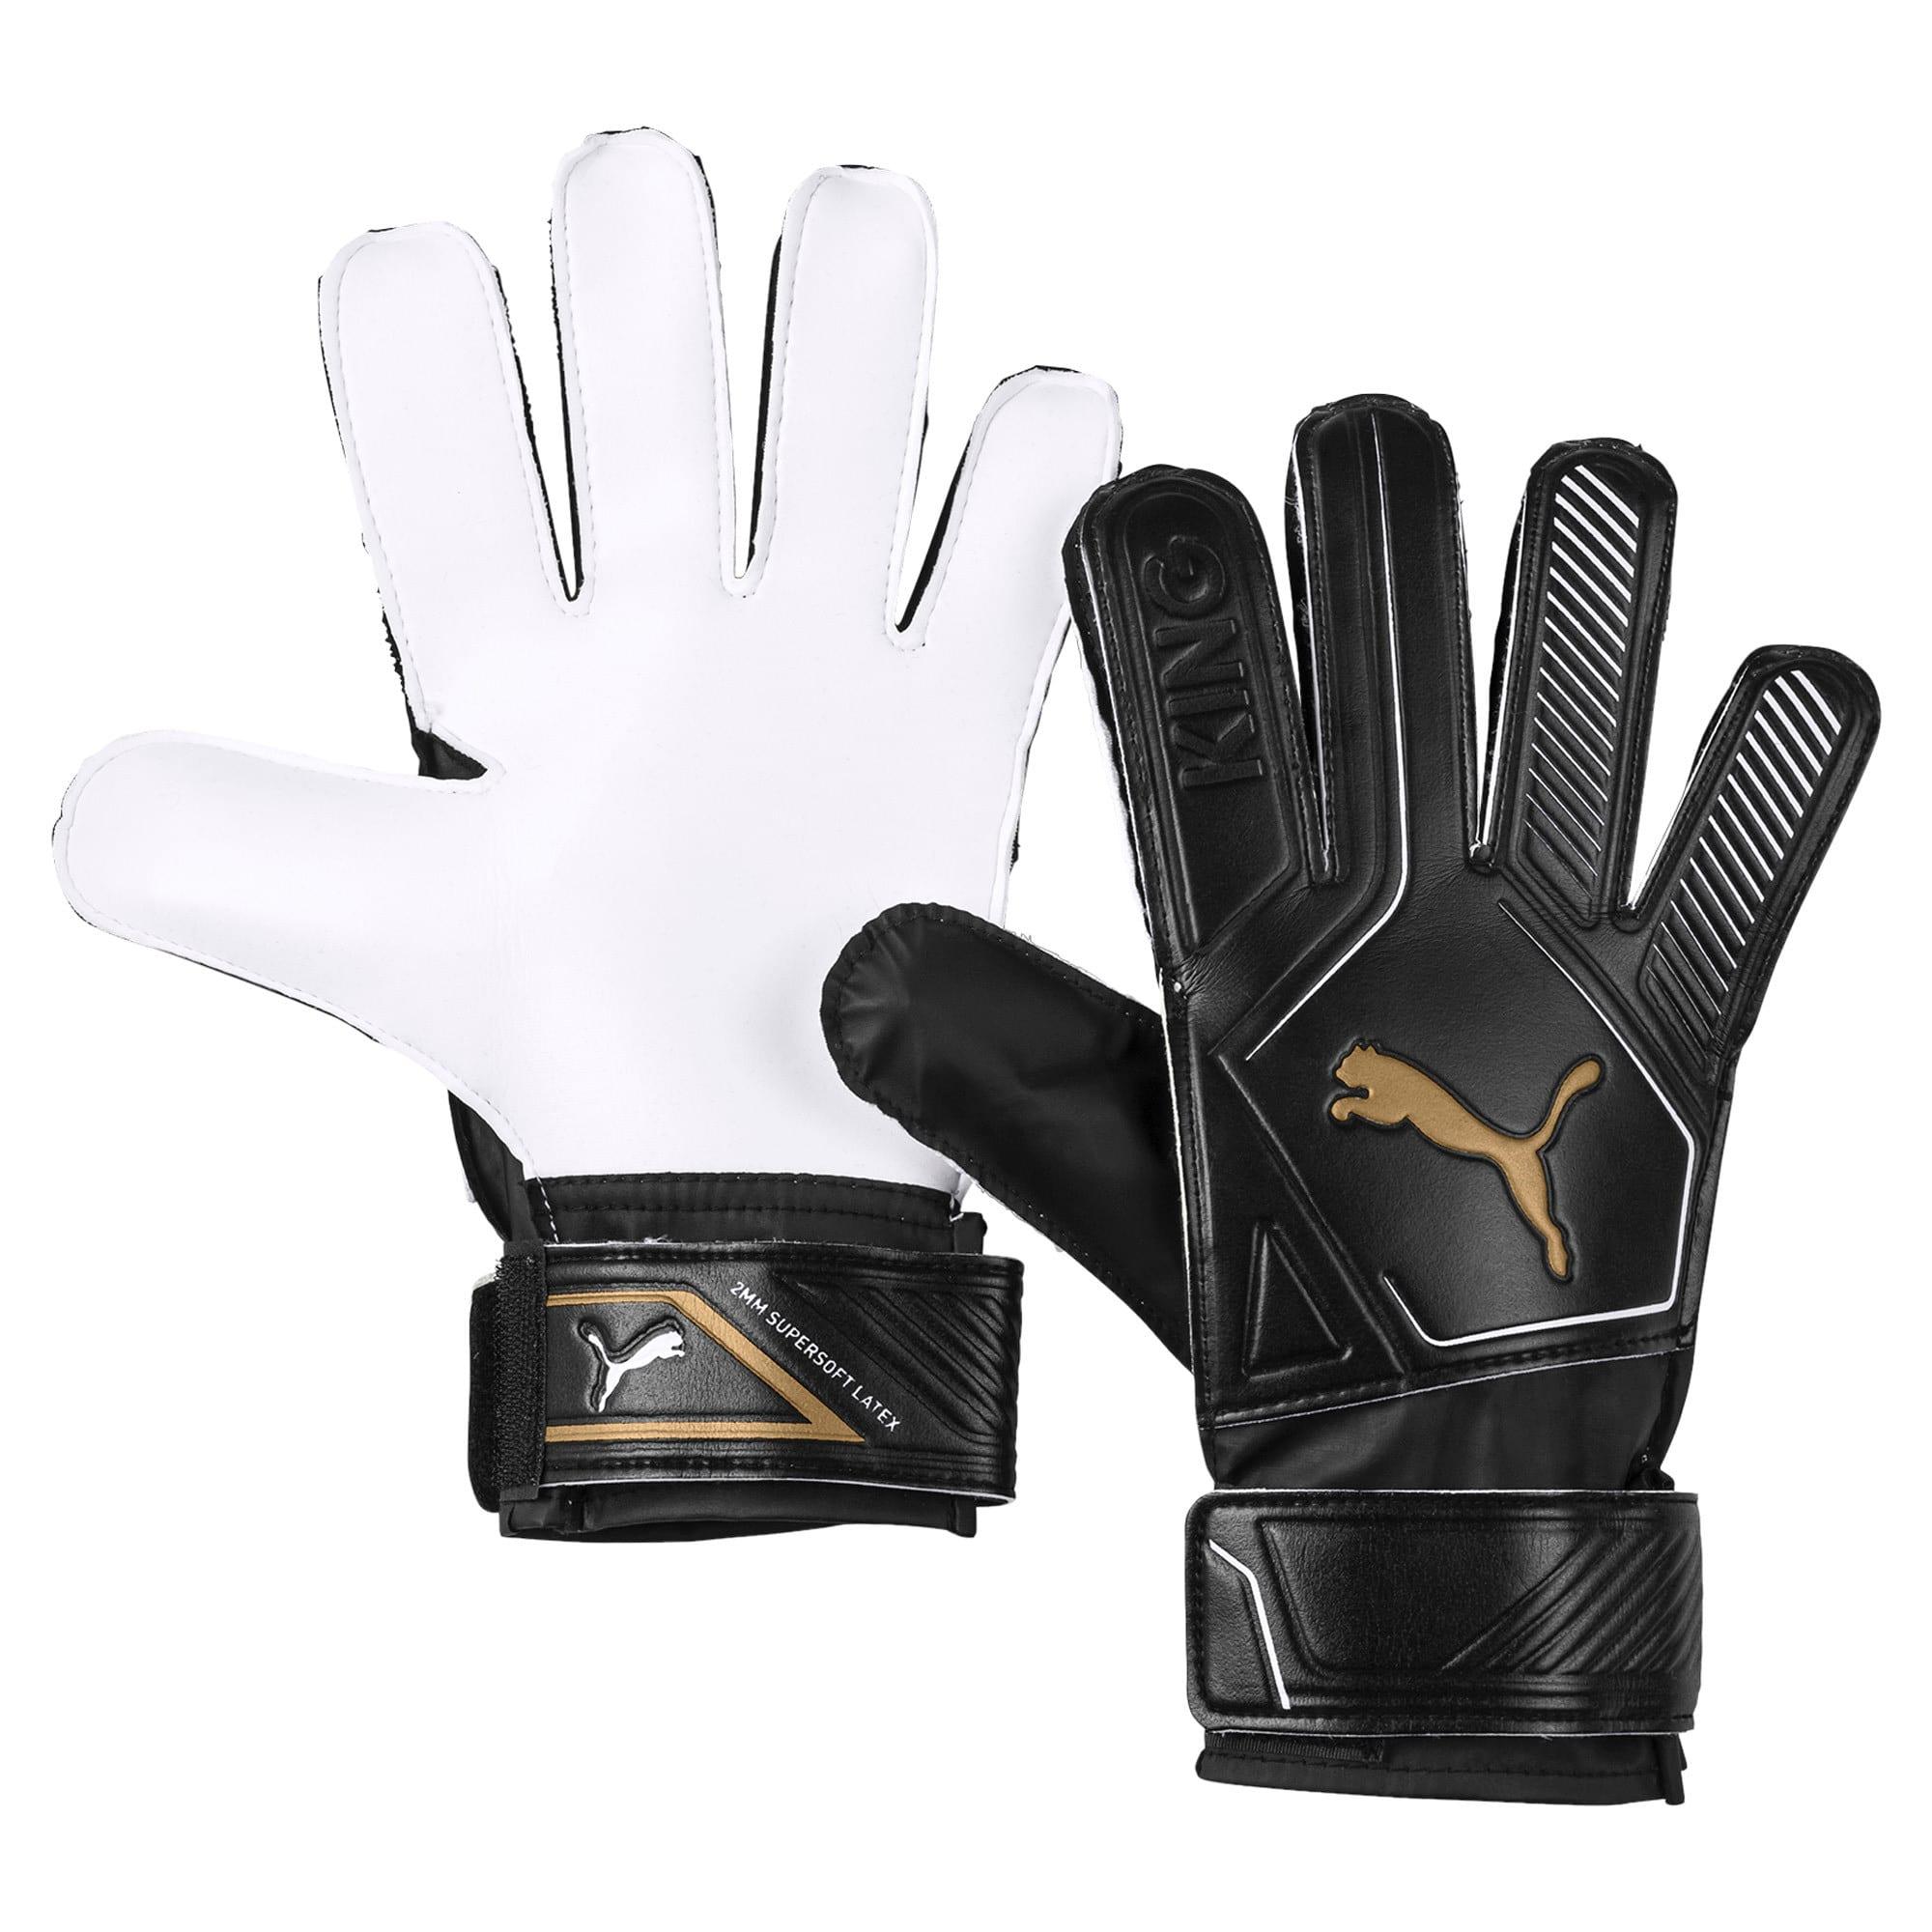 Thumbnail 1 of King 4 Goalkeeper Gloves, Puma Black-Gold-Puma White, medium